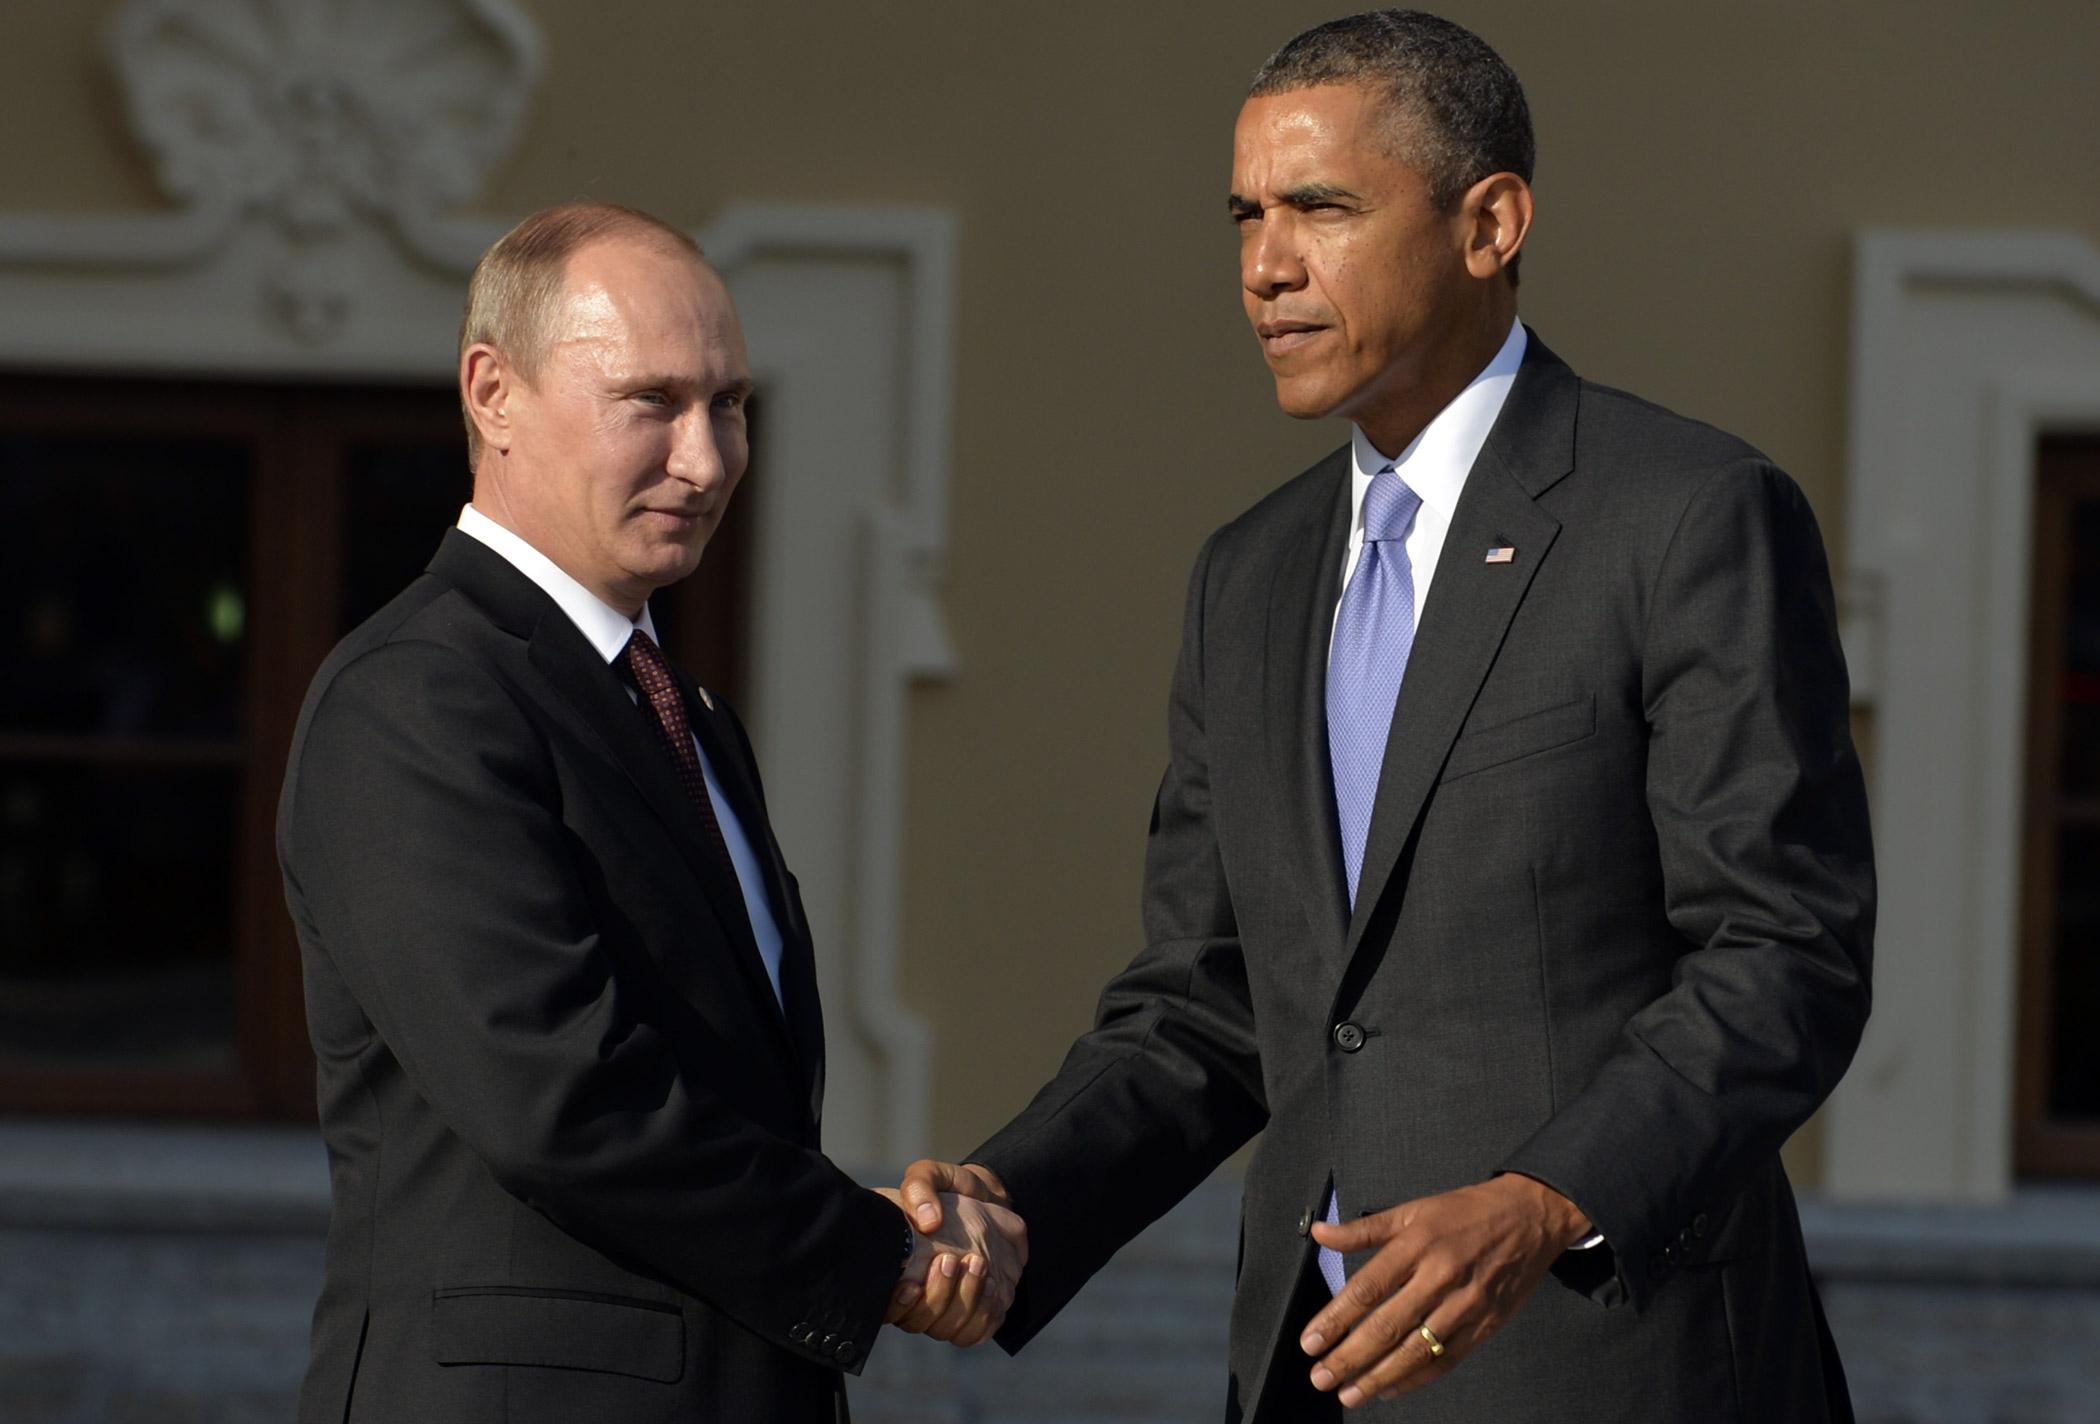 Russian President Vladimir Putin and U.S. President Barack Obama shake hands at the G20 summit in Saint Petersburg on Sept. 5, 2013.